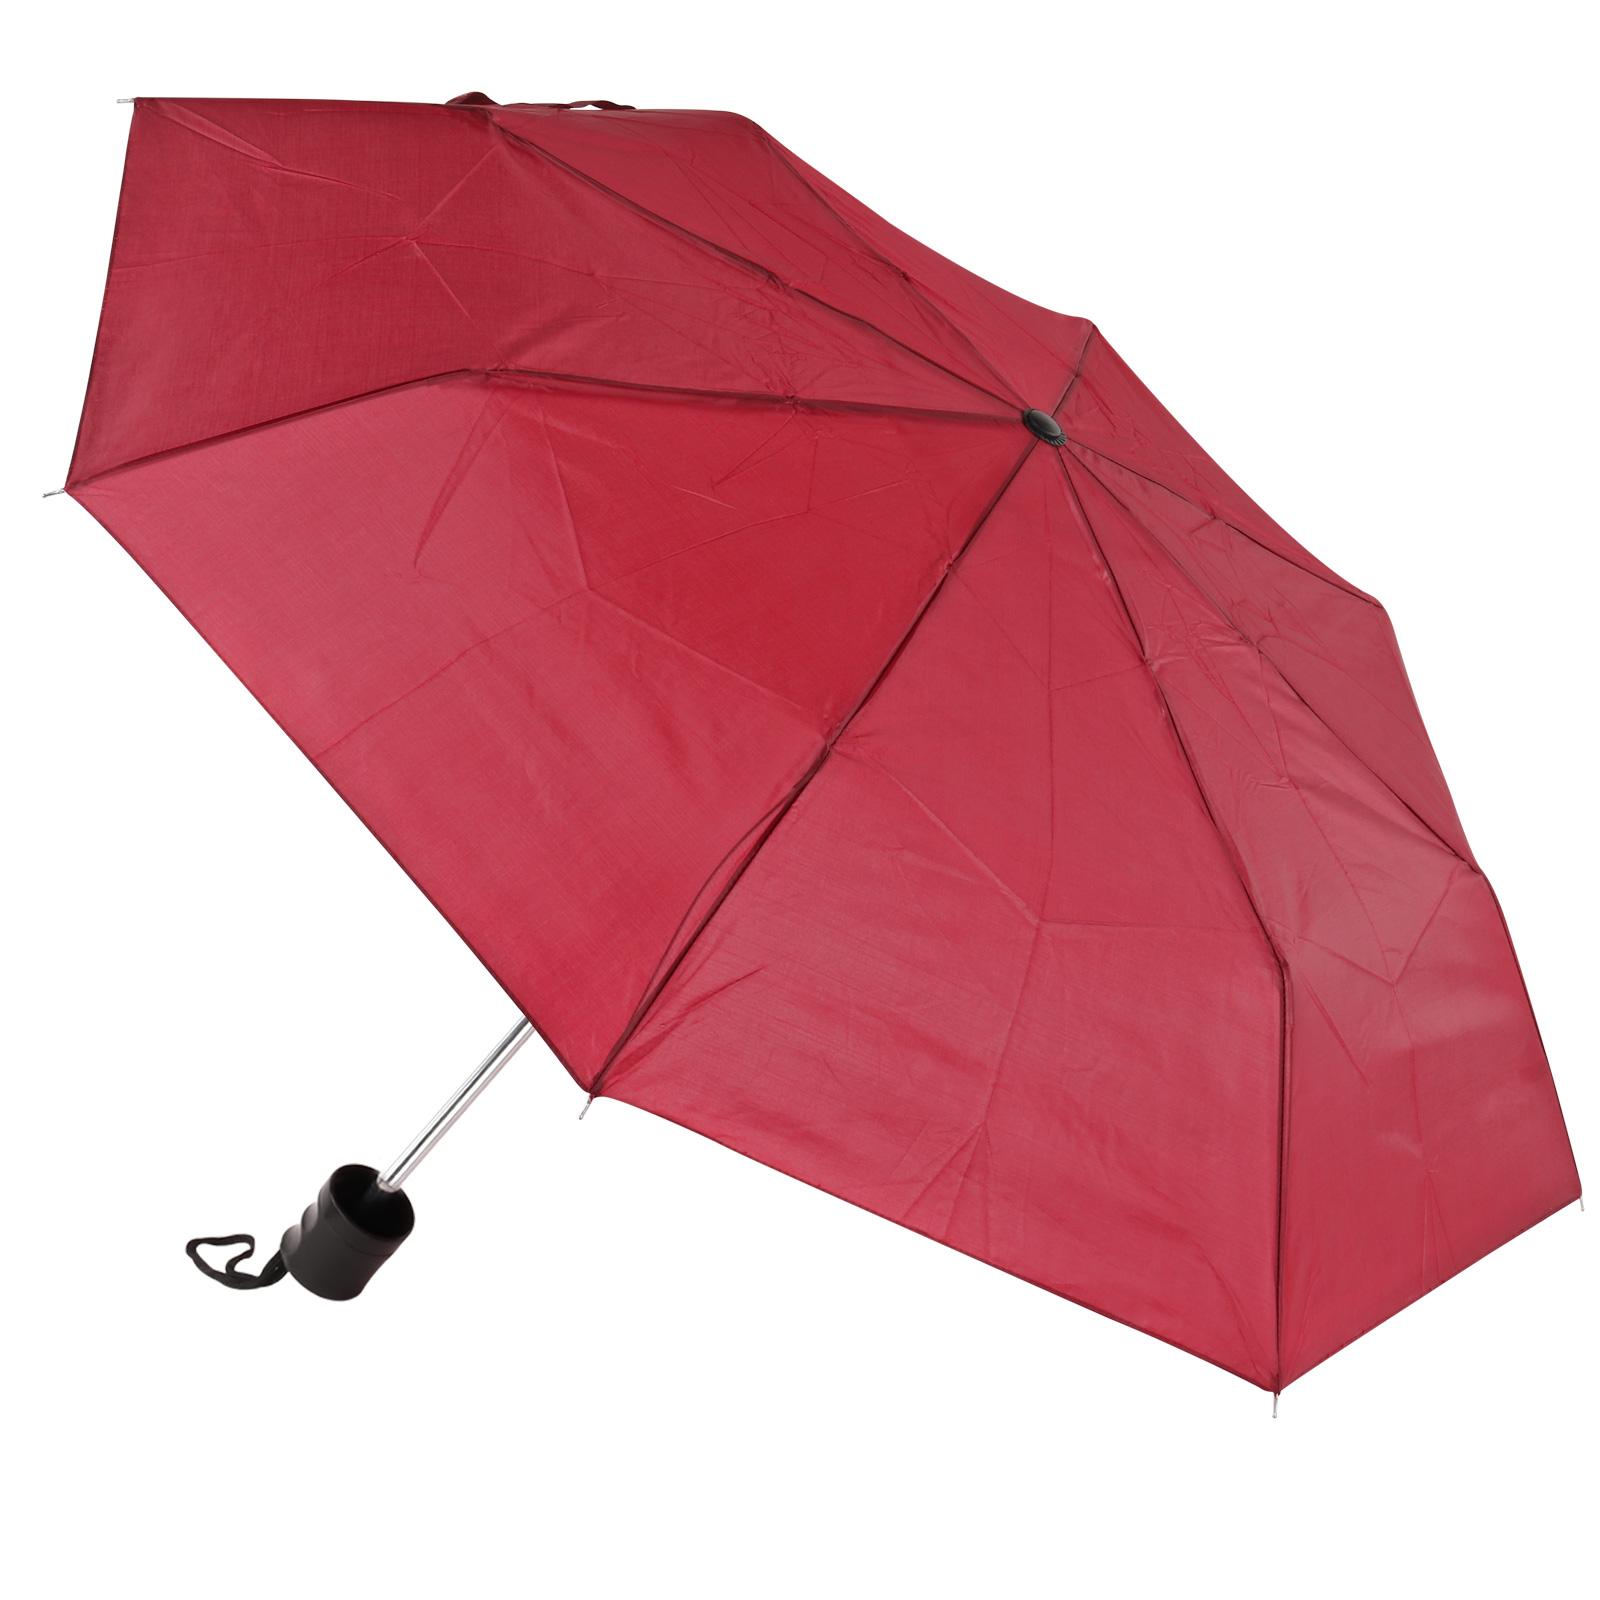 Amrini Regenschirm Mini rot 100cm Spannweite Mini Packmaß 25x5cm